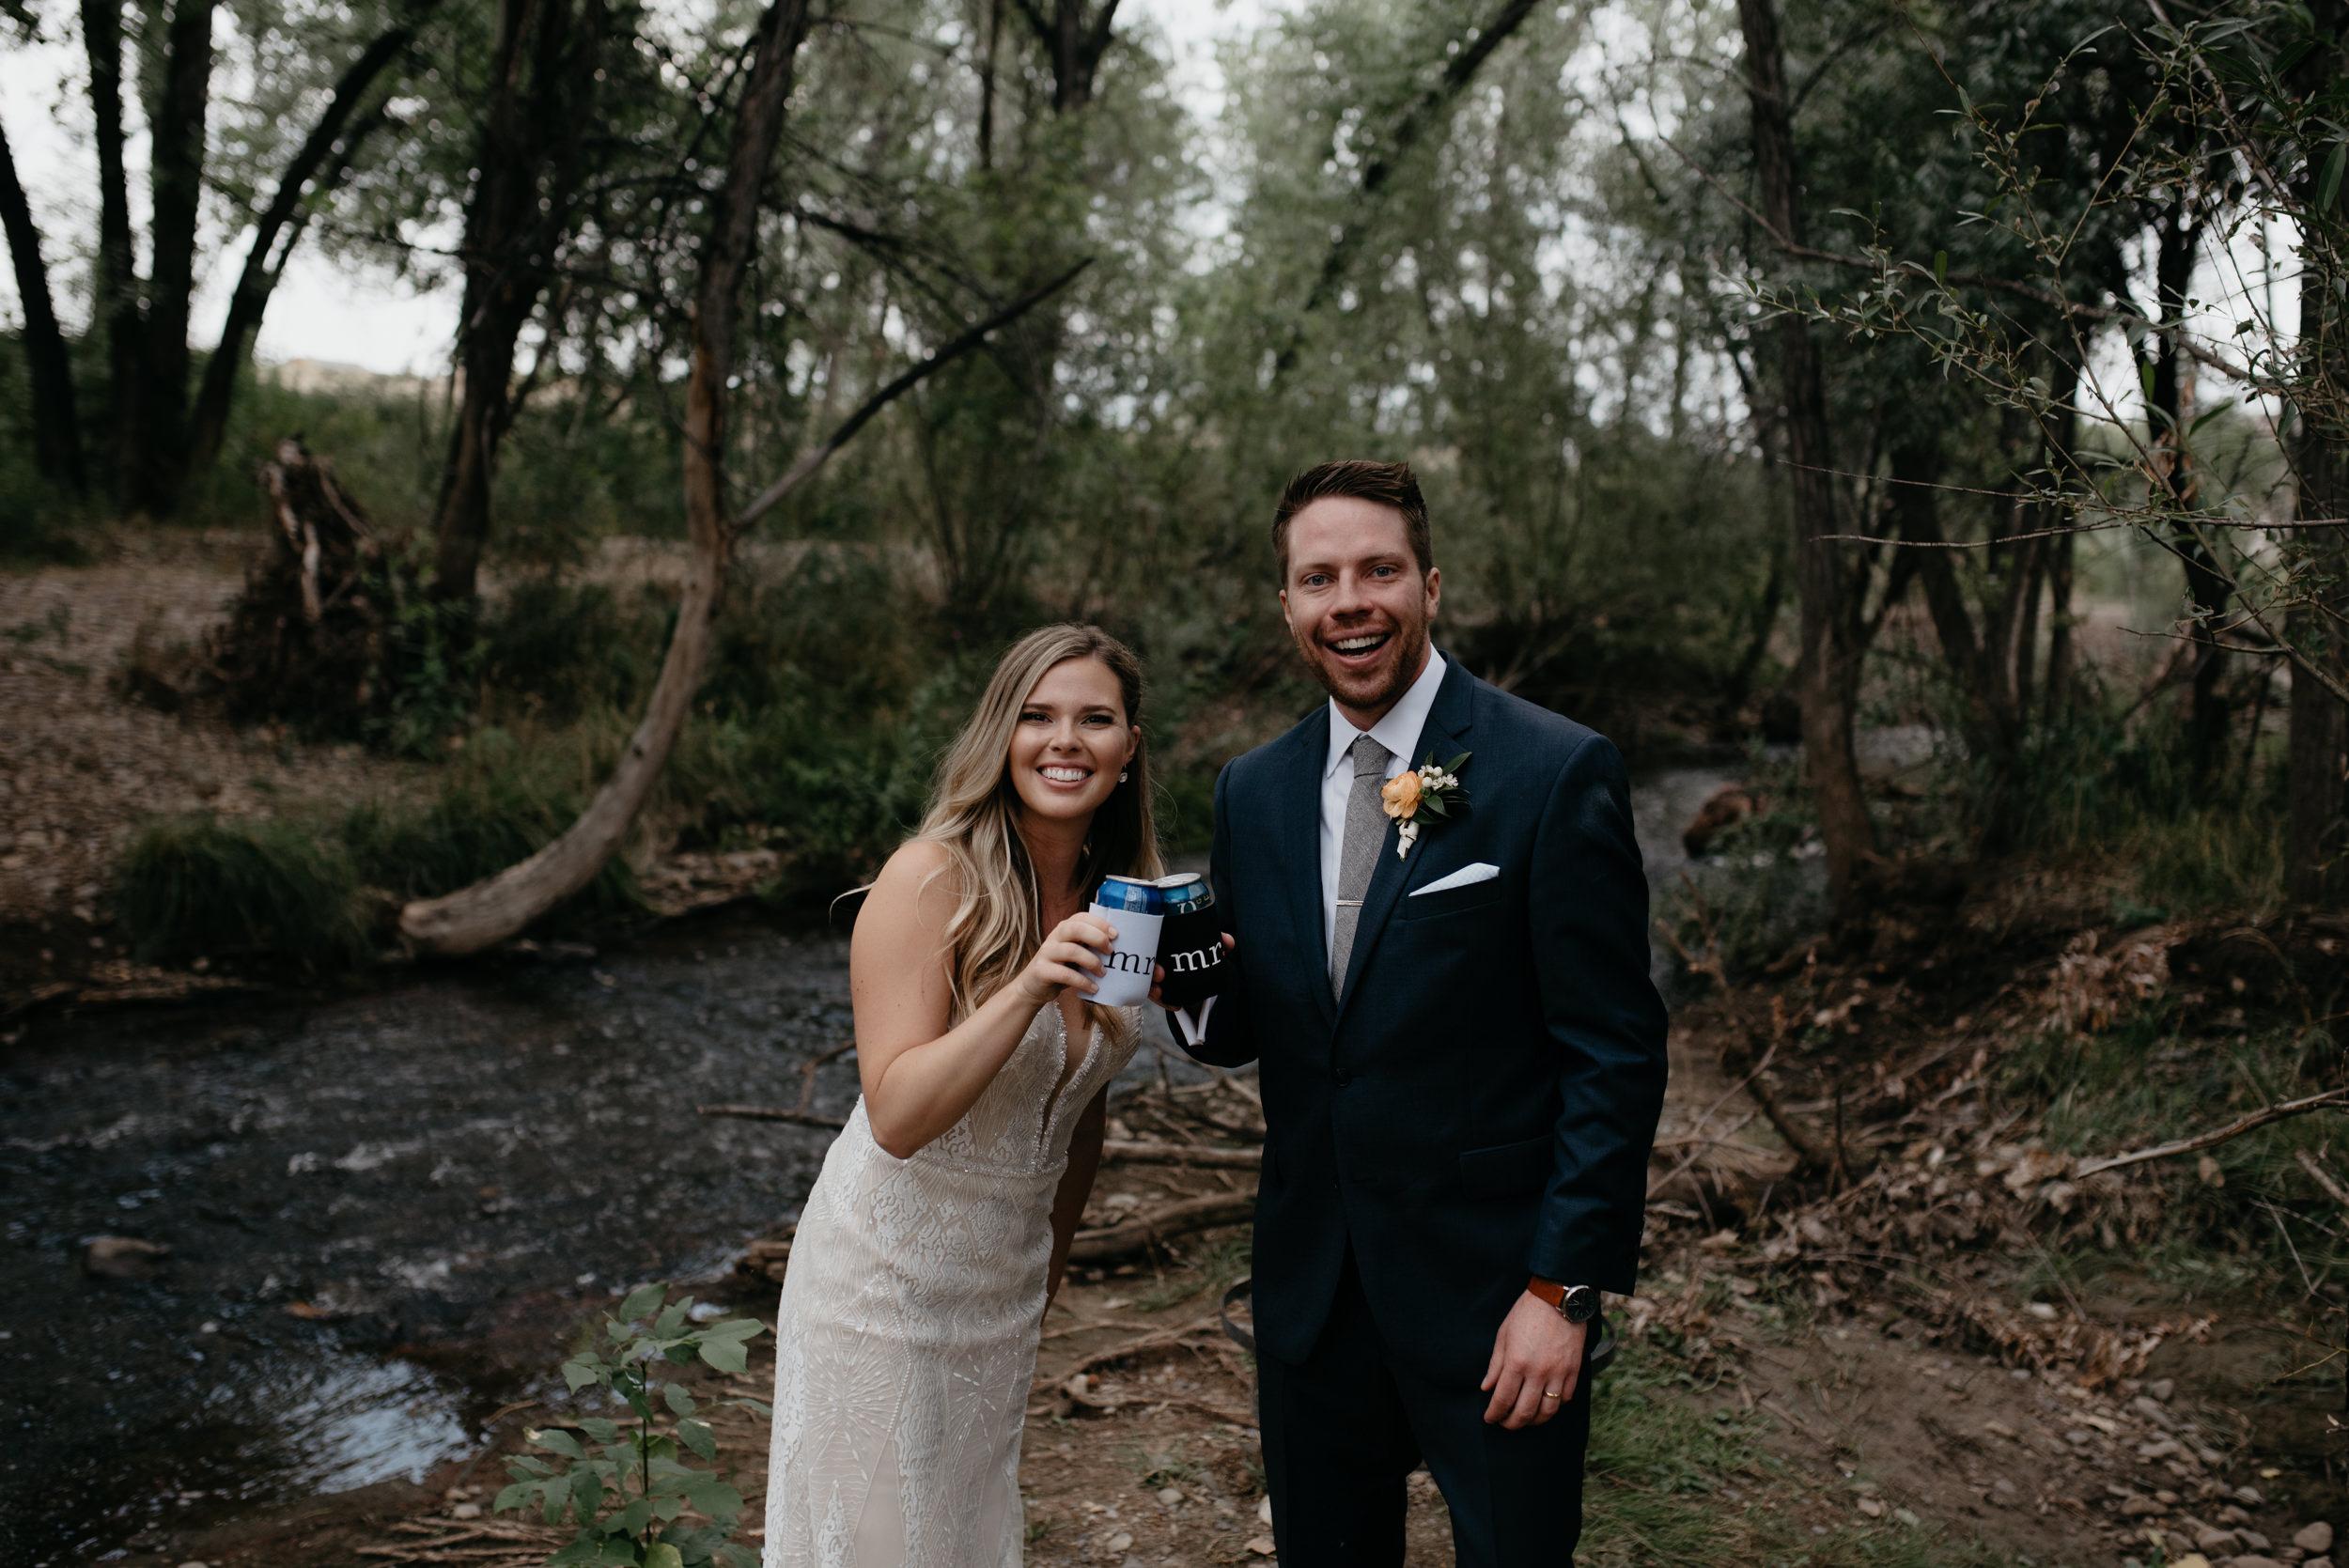 Colorado mountain wedding photos. Wedding at Three Leaf Farm in Boulder, Colorado.